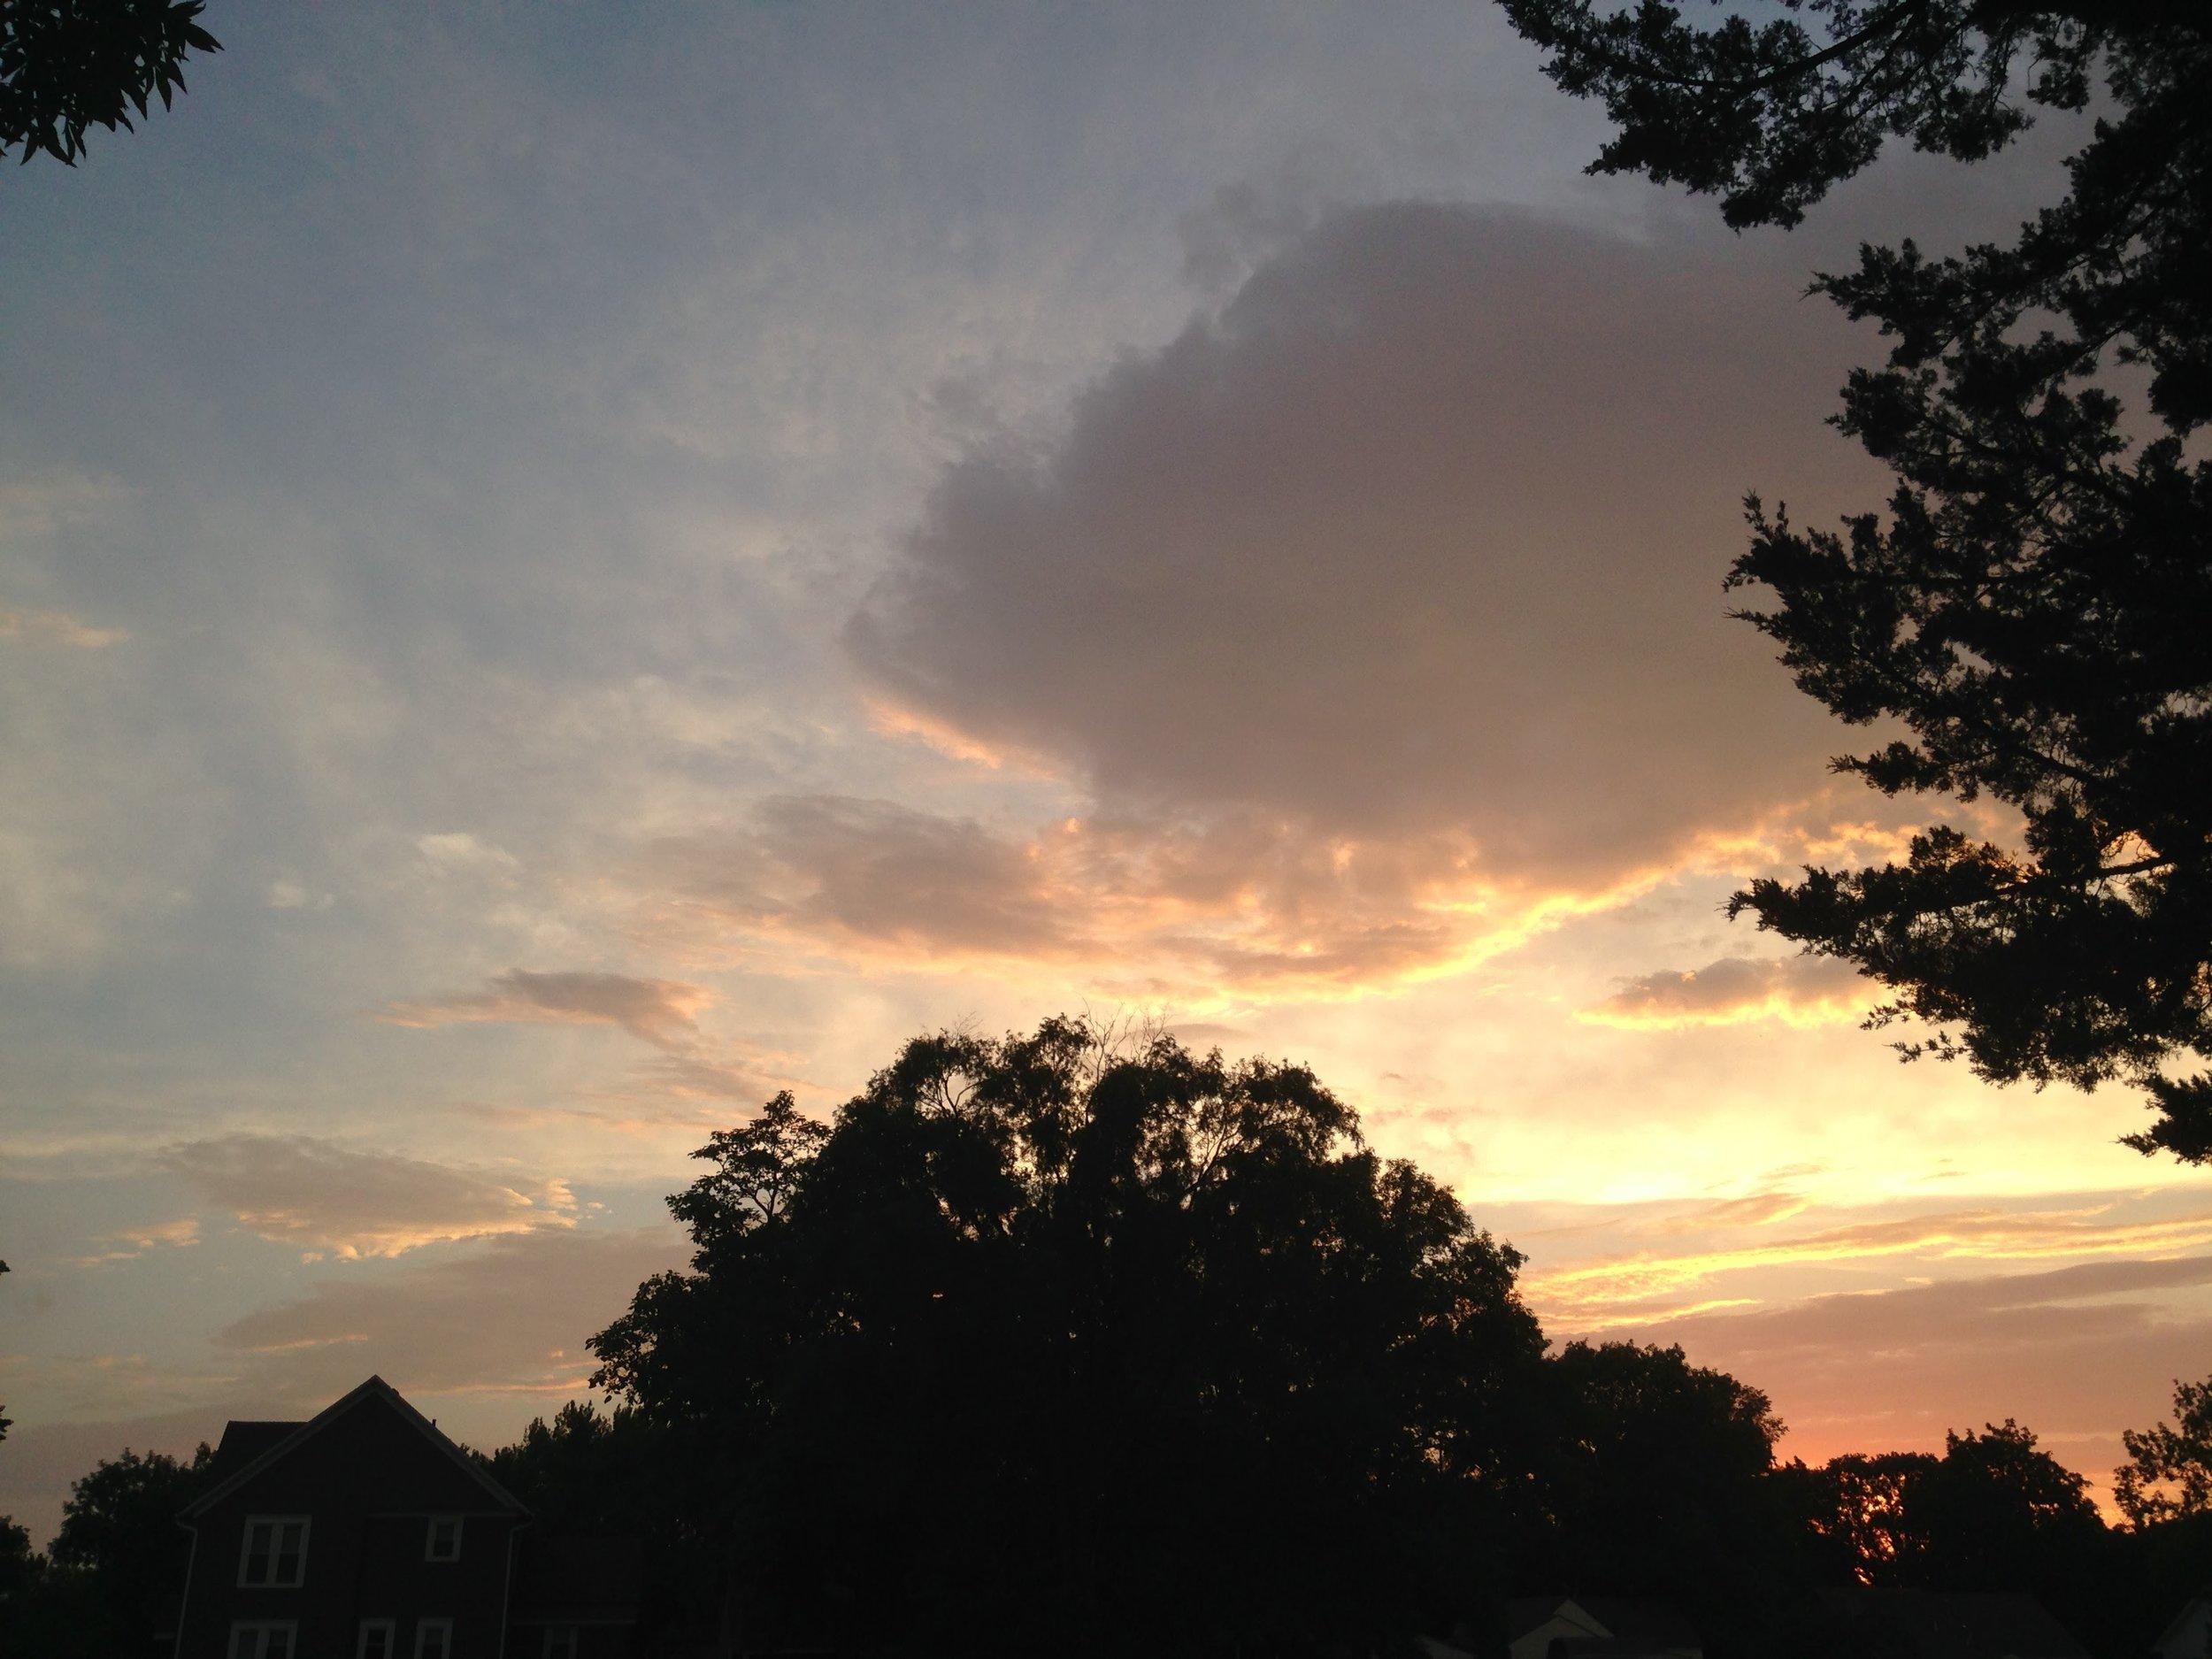 darkest-hour-brightest-hope-sparkles-by-ashlee.jpg